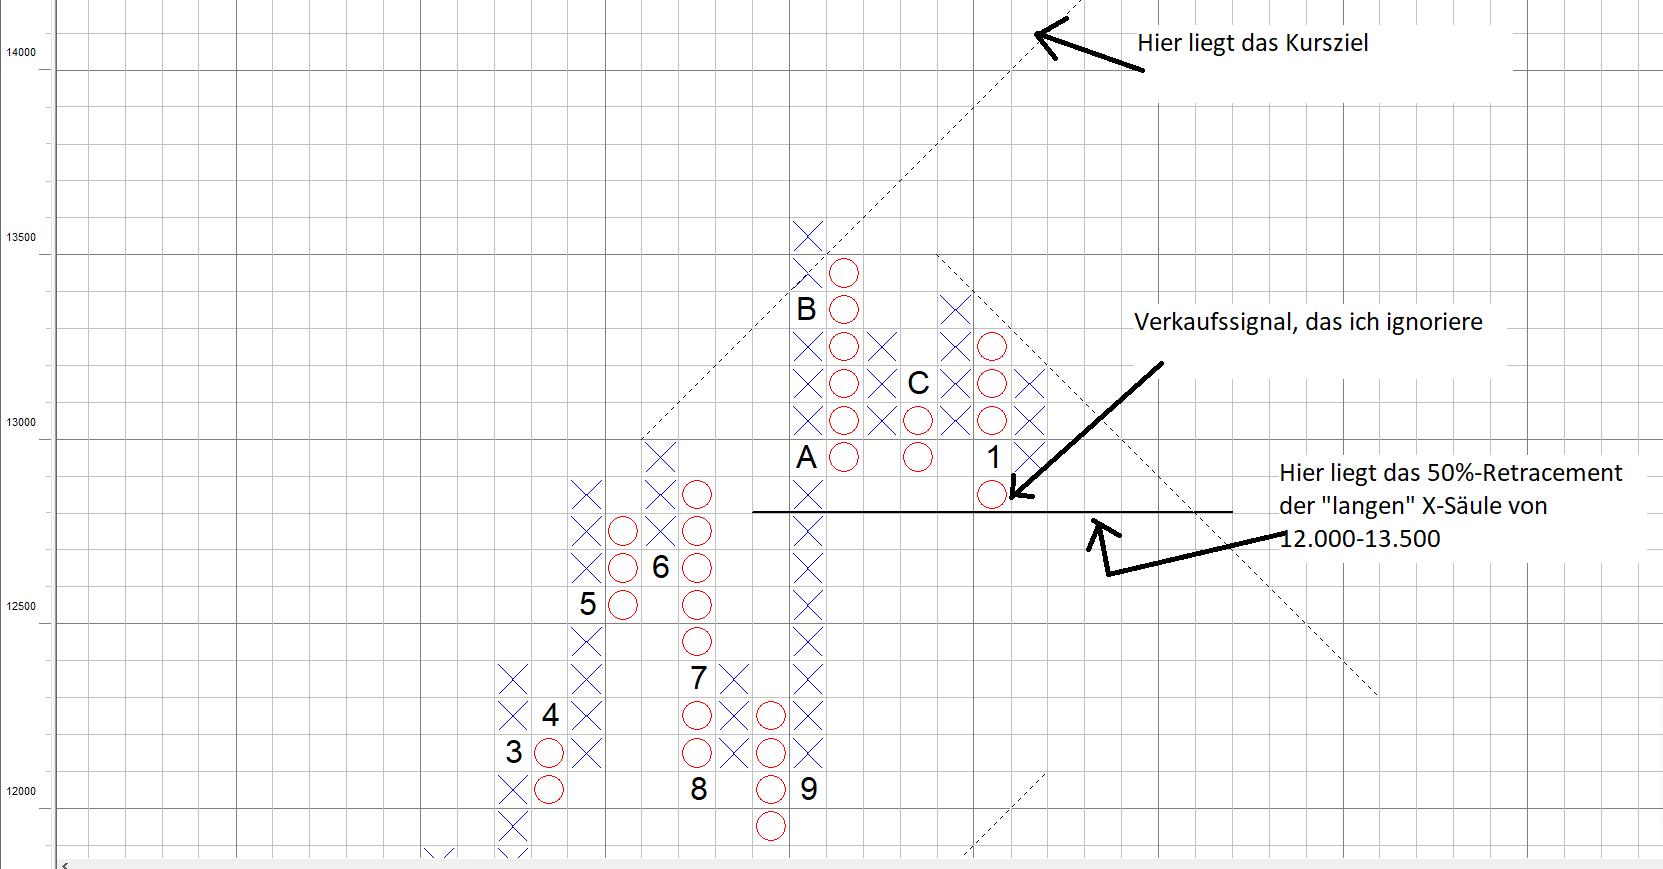 14200 im DAX Kursziel steht per Point and Figure